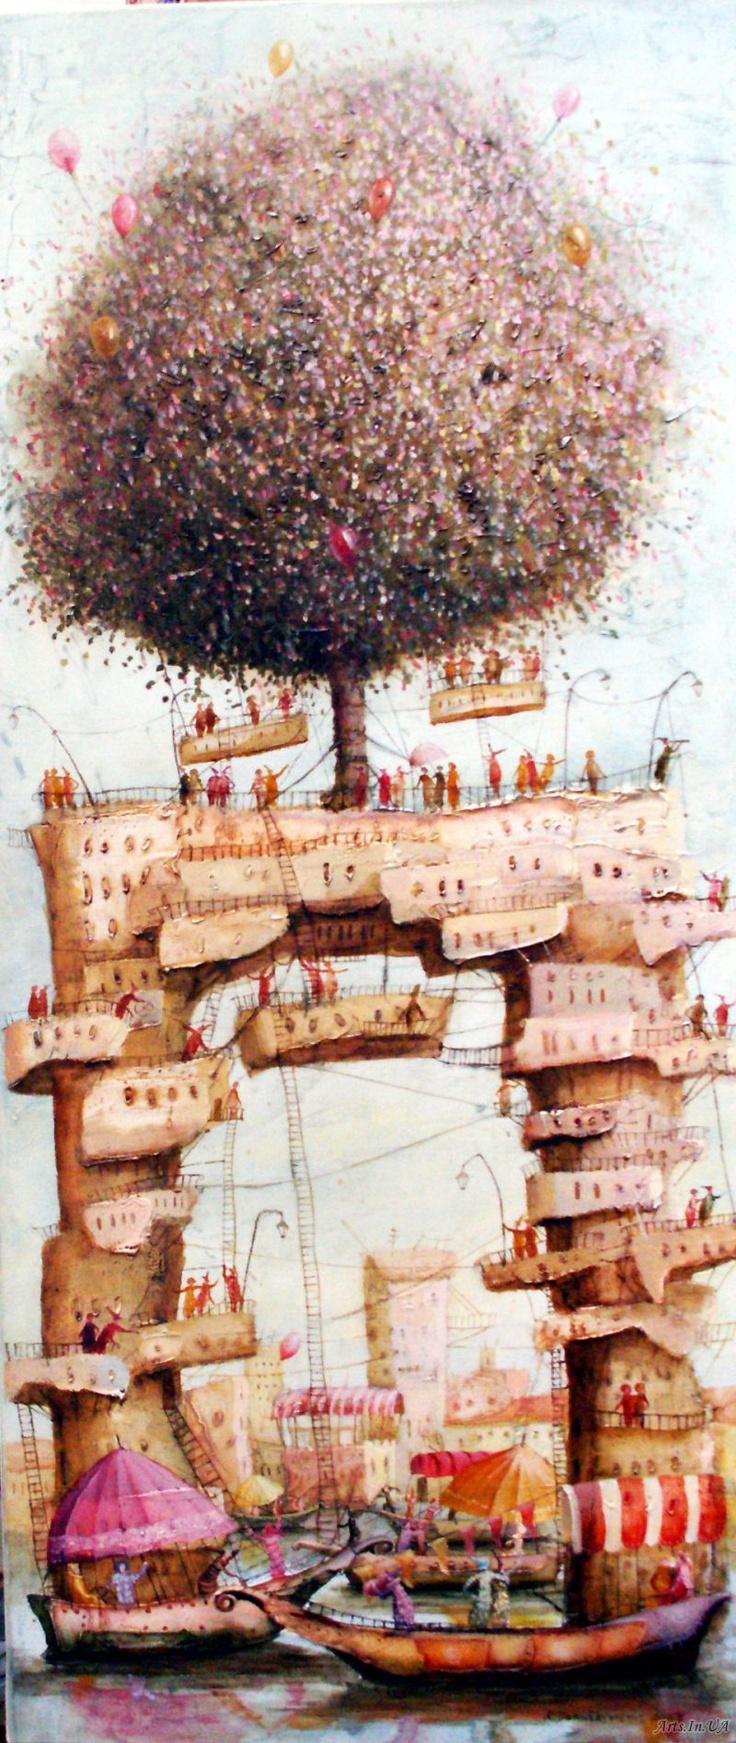 Januskevicius Remigijus - Tree on the Bridge